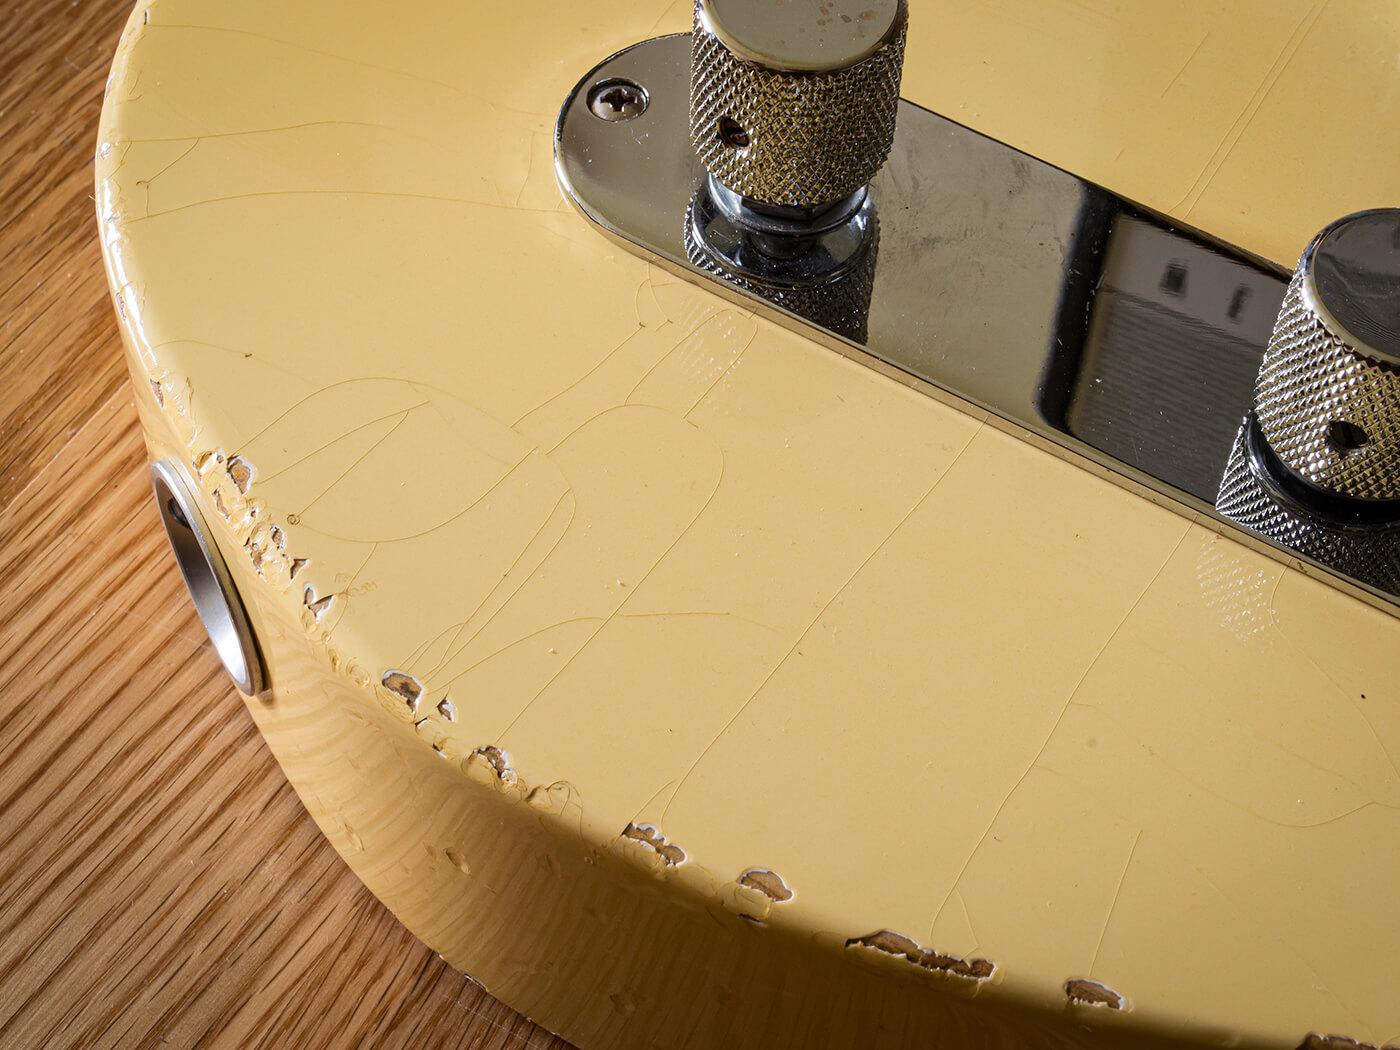 DIY Workshop: Telecaster to Esquire Conversion 8